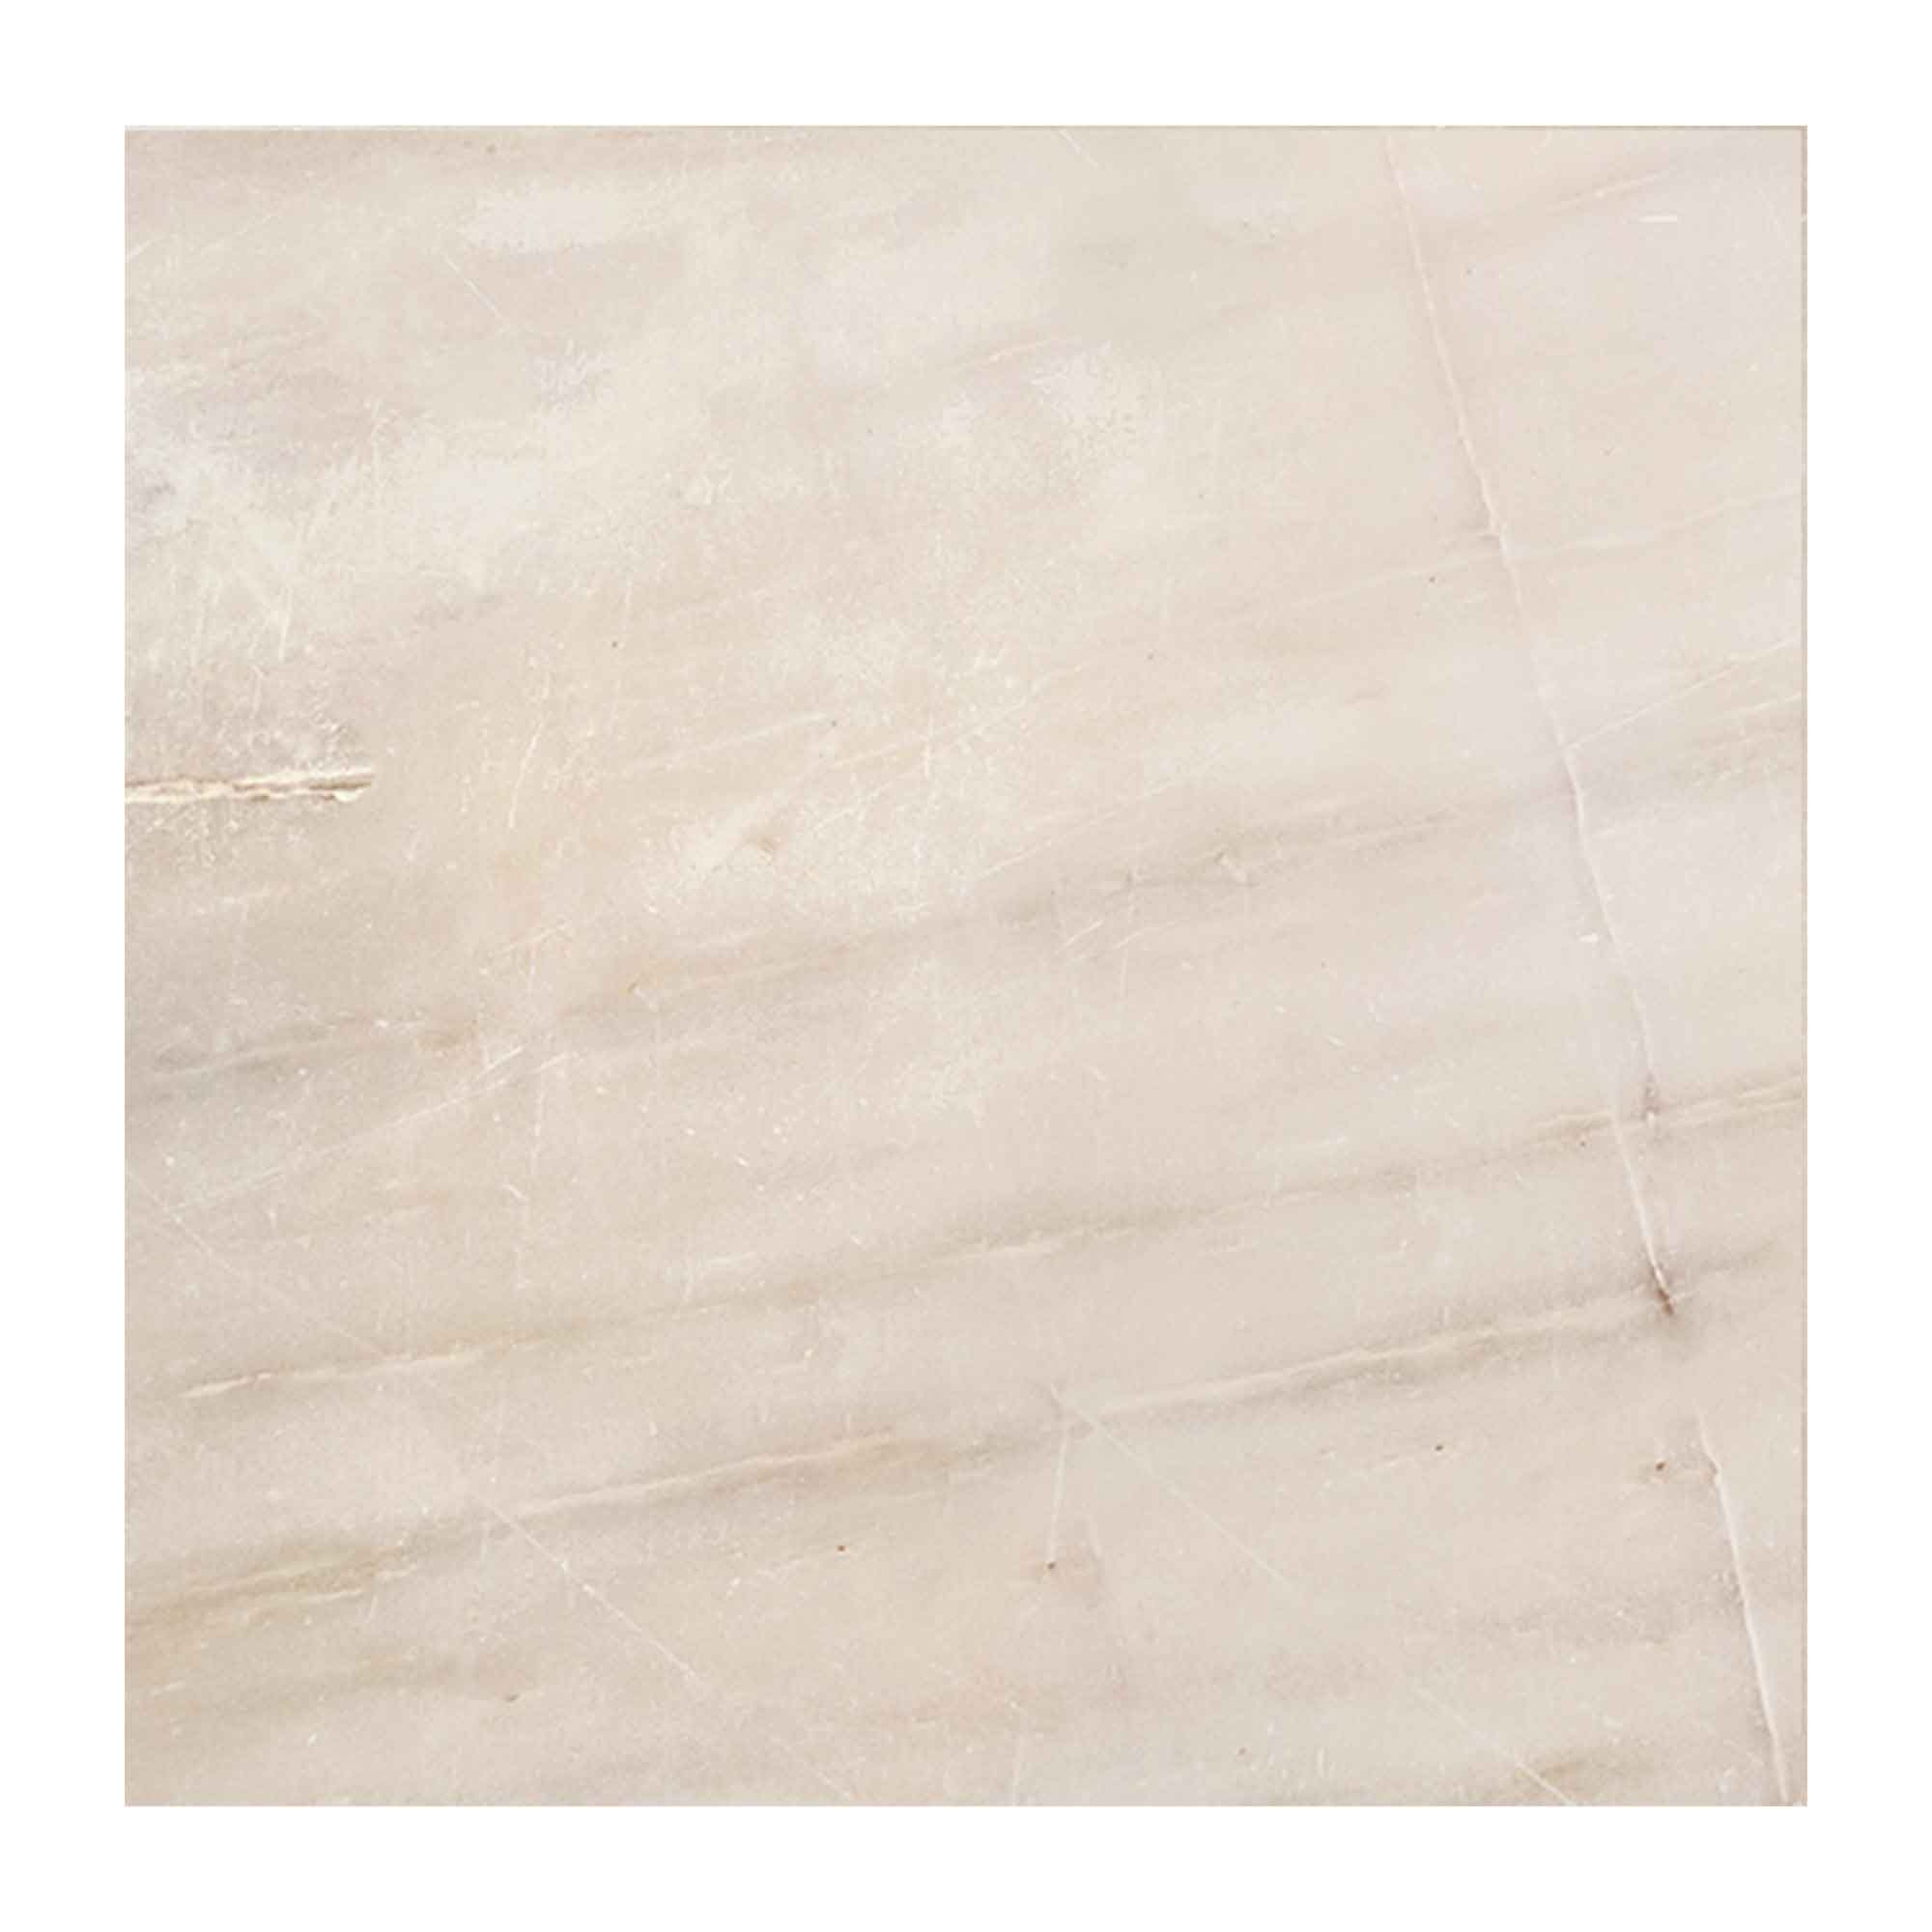 Gresie portelanata Cesarom Soft PEI 4, bej mat, patrata, 33 x 33 cm mathaus 2021